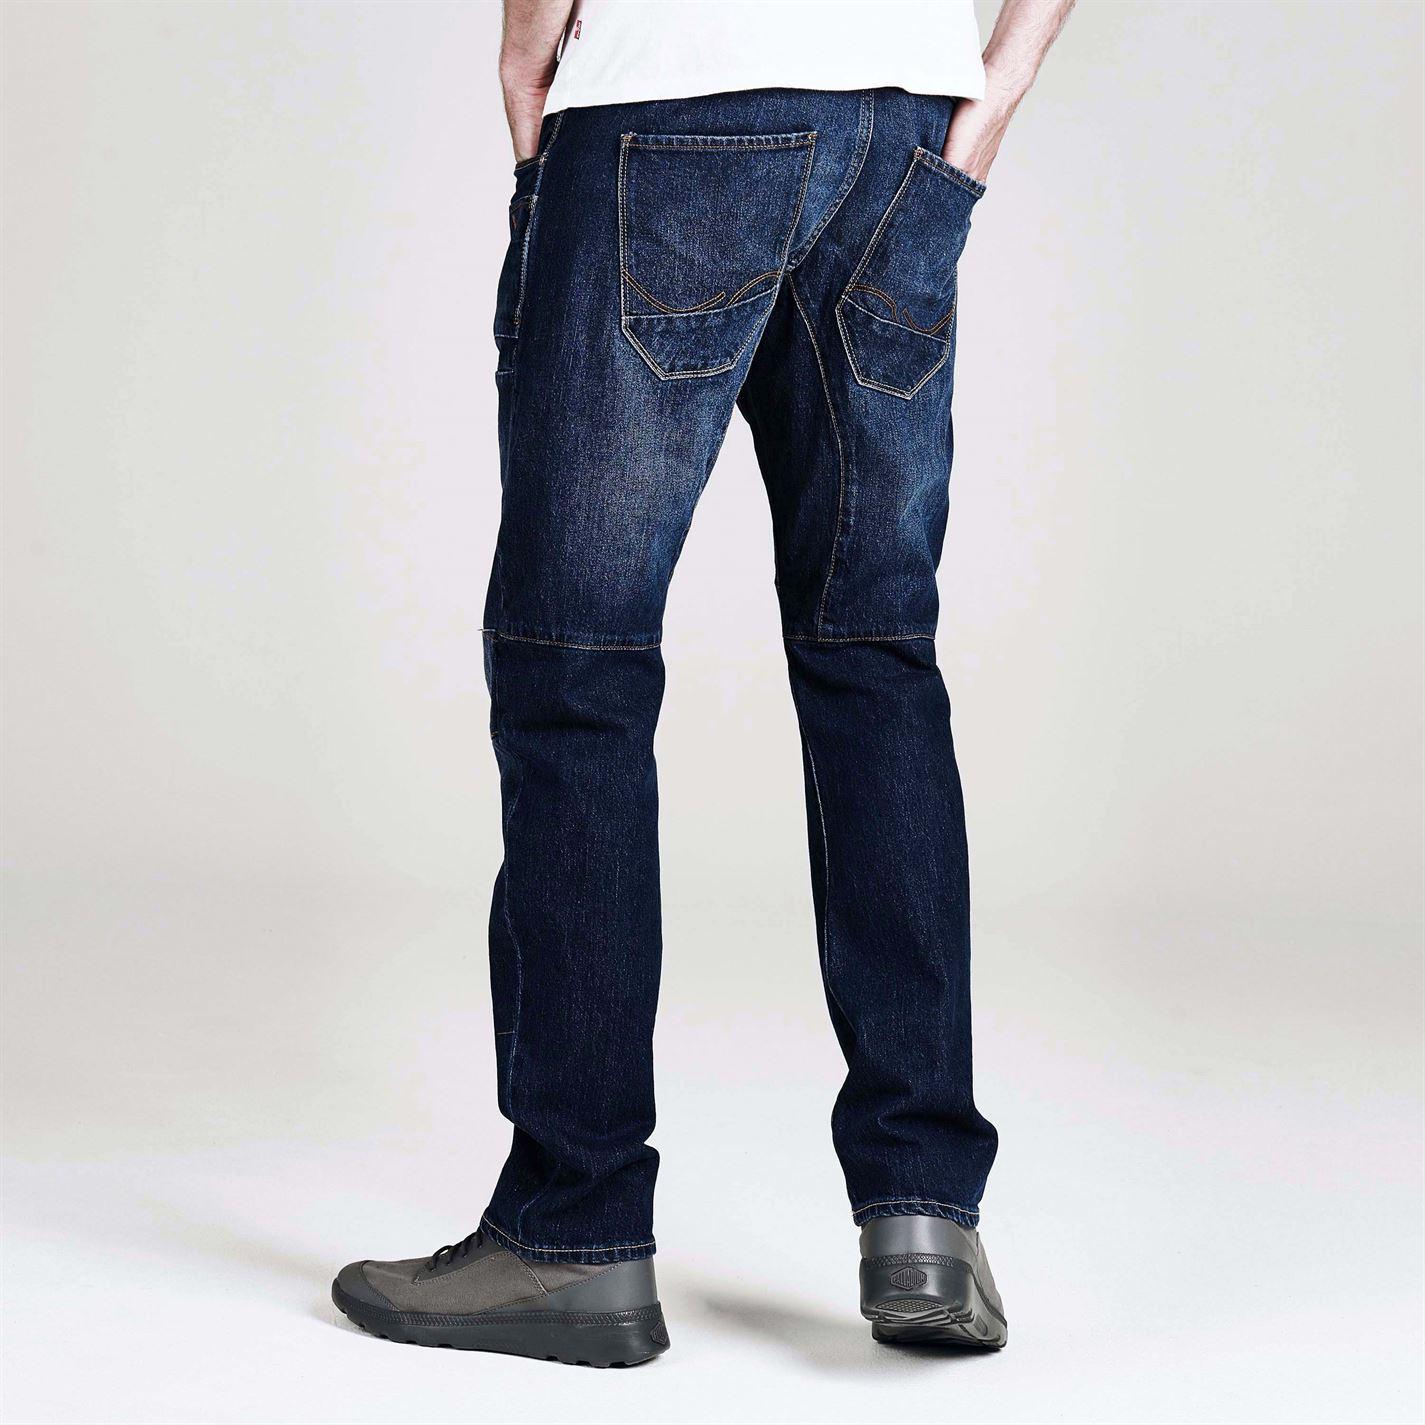 Jean-Denim-Jack-and-Jones-Stan-Osaka-Anti-Fit-de-Jean-para-Hombre-Pantalones-Pantalon-Oscuro-Wash miniatura 9